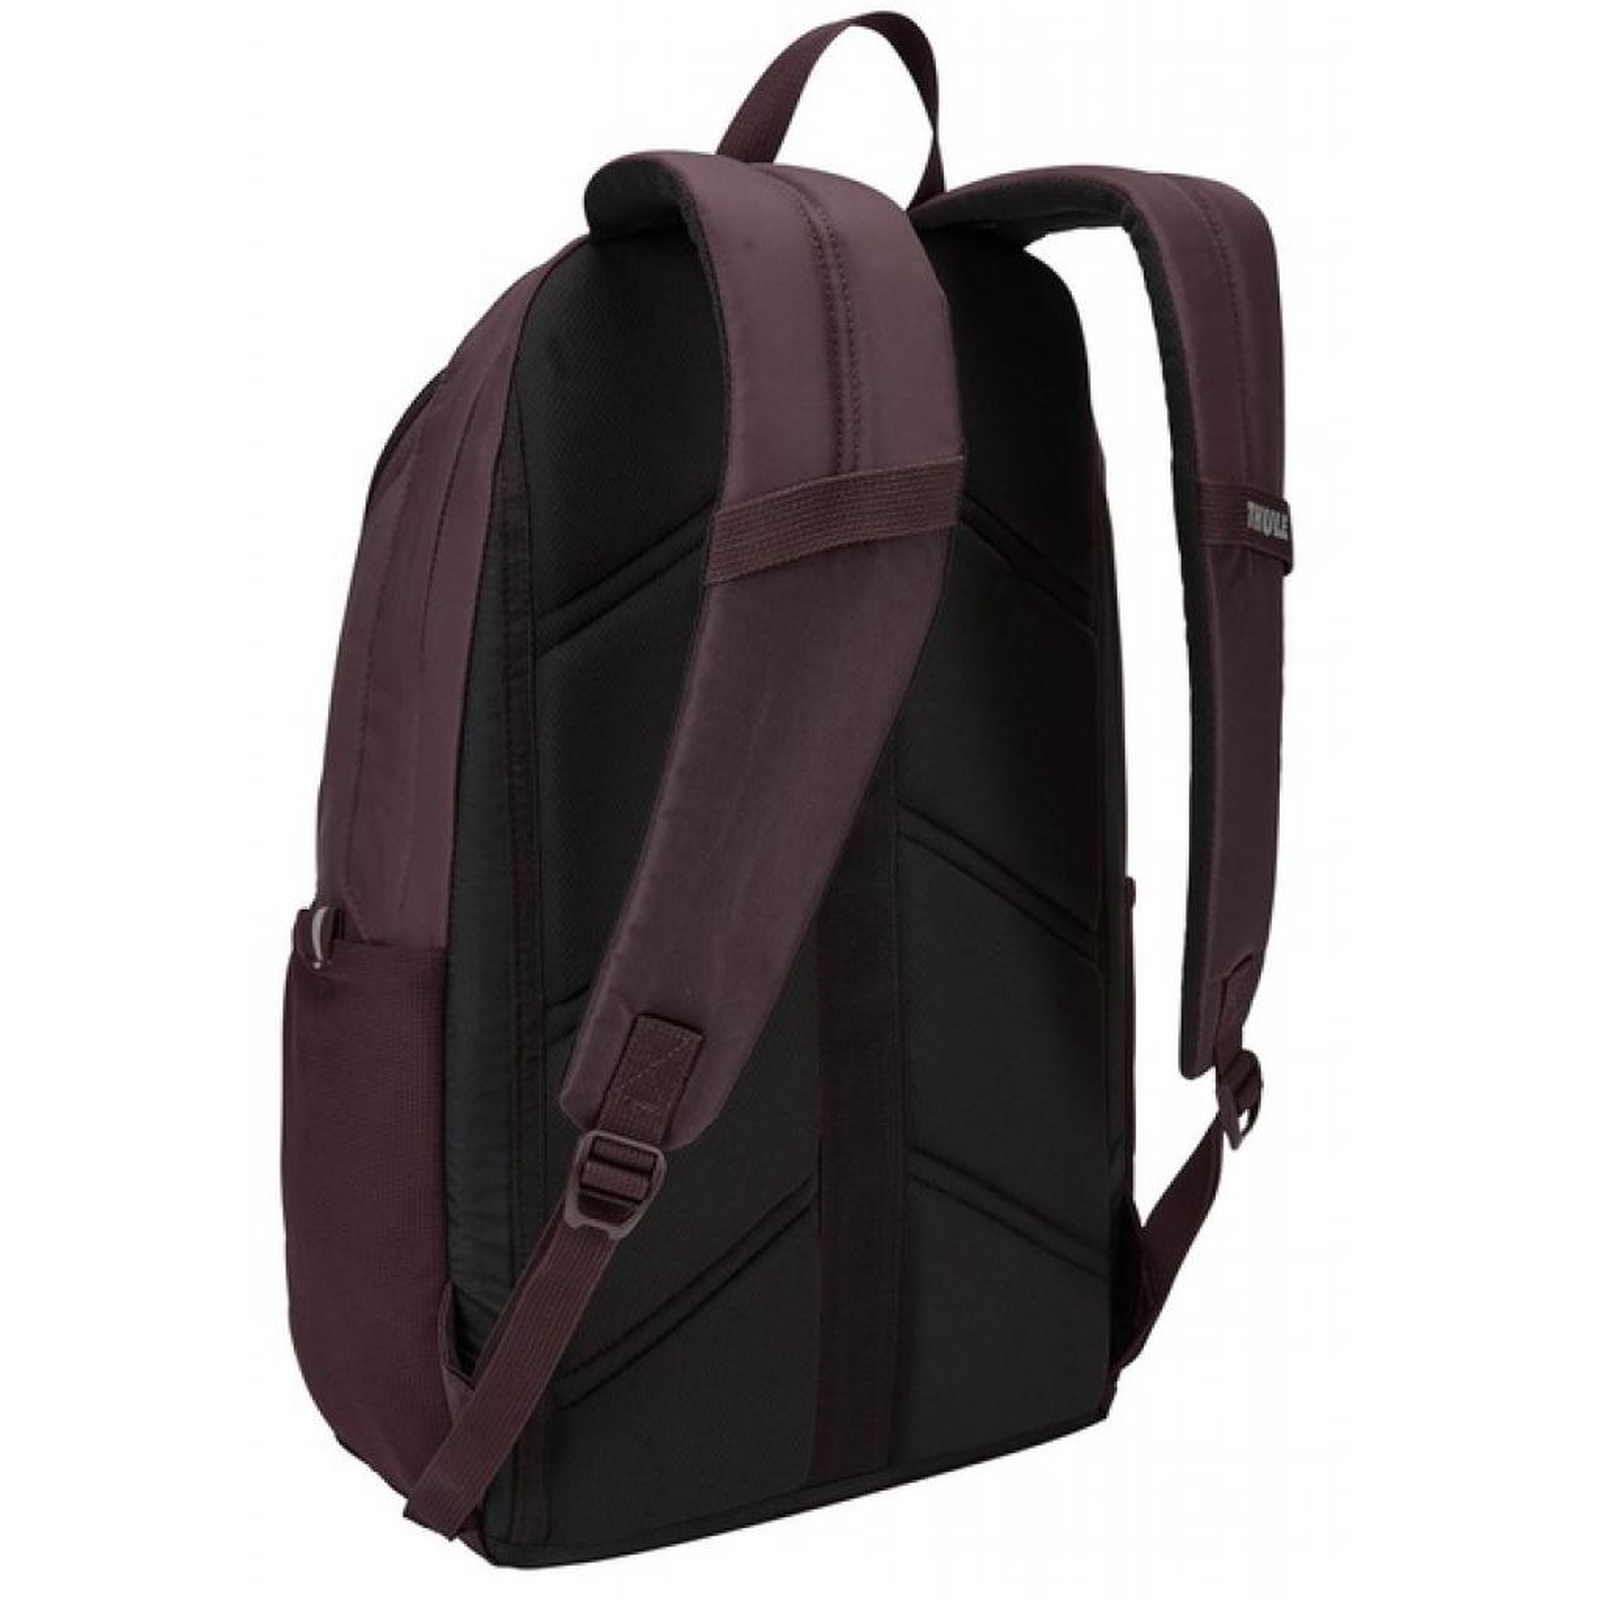 "Рюкзак для ноутбука Thule 15"" Departer 21L Corsair/Bluegrass TDMB-115 (3202905) изображение 2"